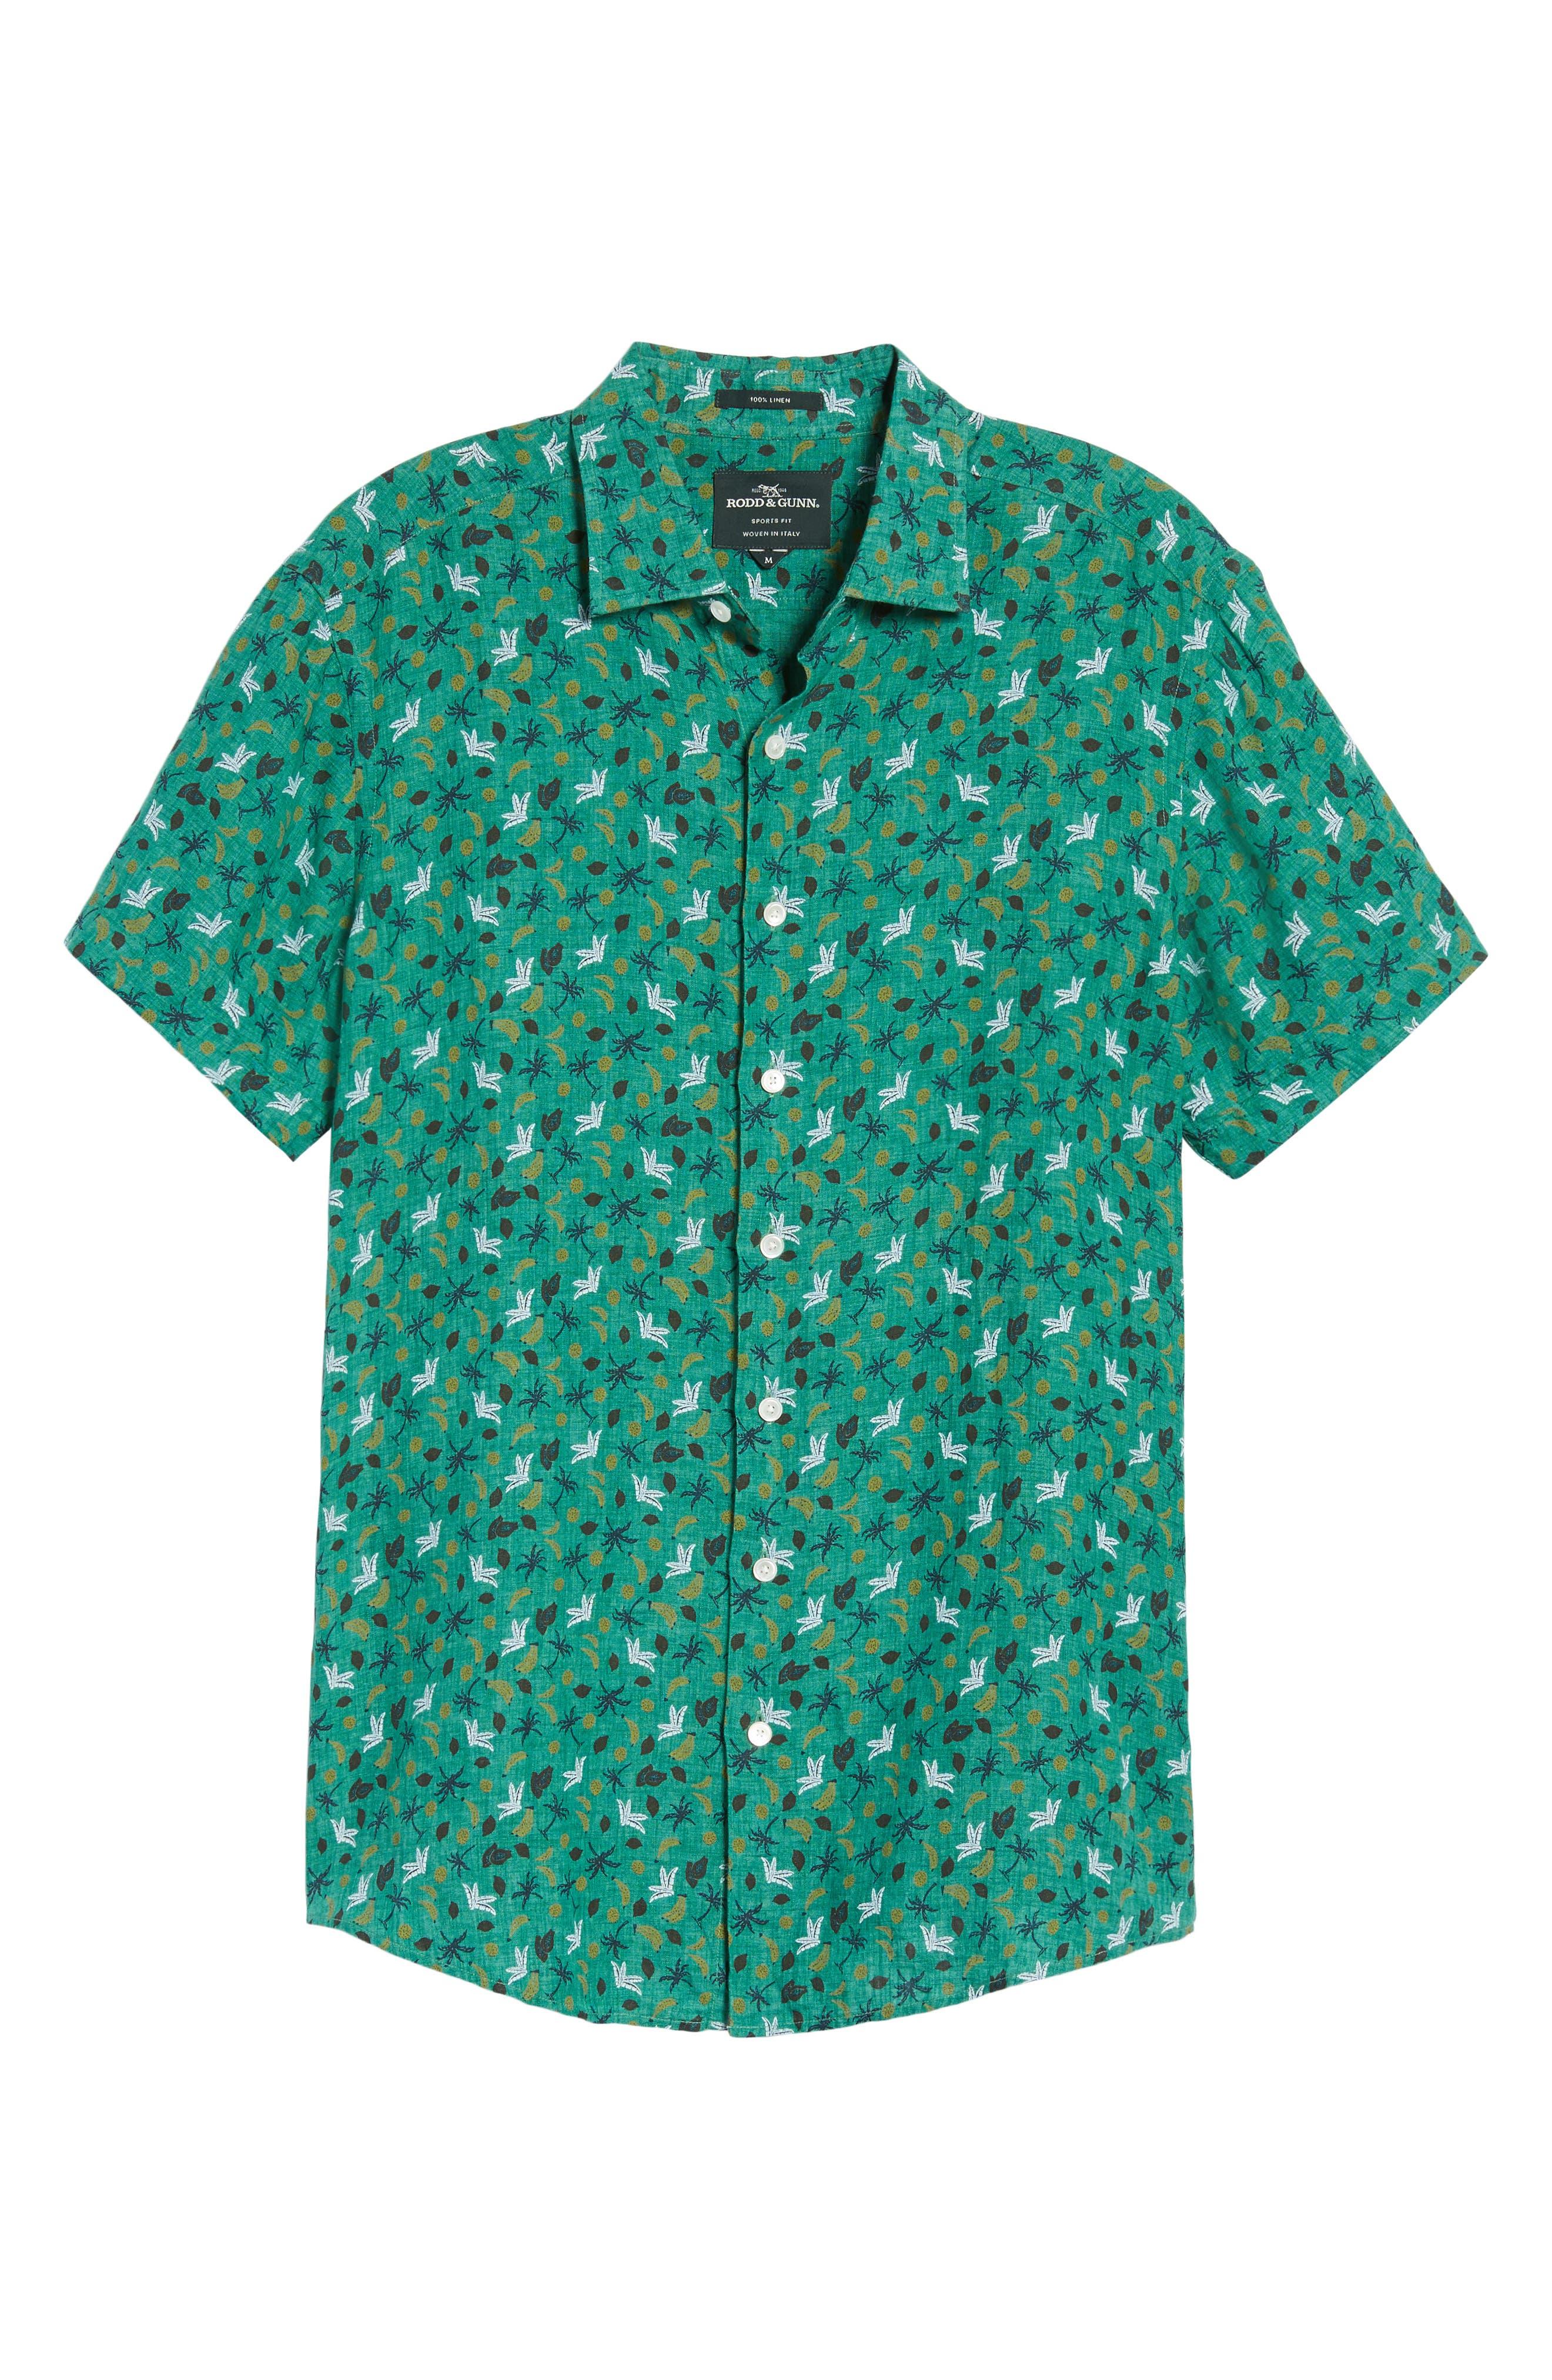 Canoe Creek Tropical Print Linen Sport Shirt,                             Alternate thumbnail 6, color,                             Bamboo